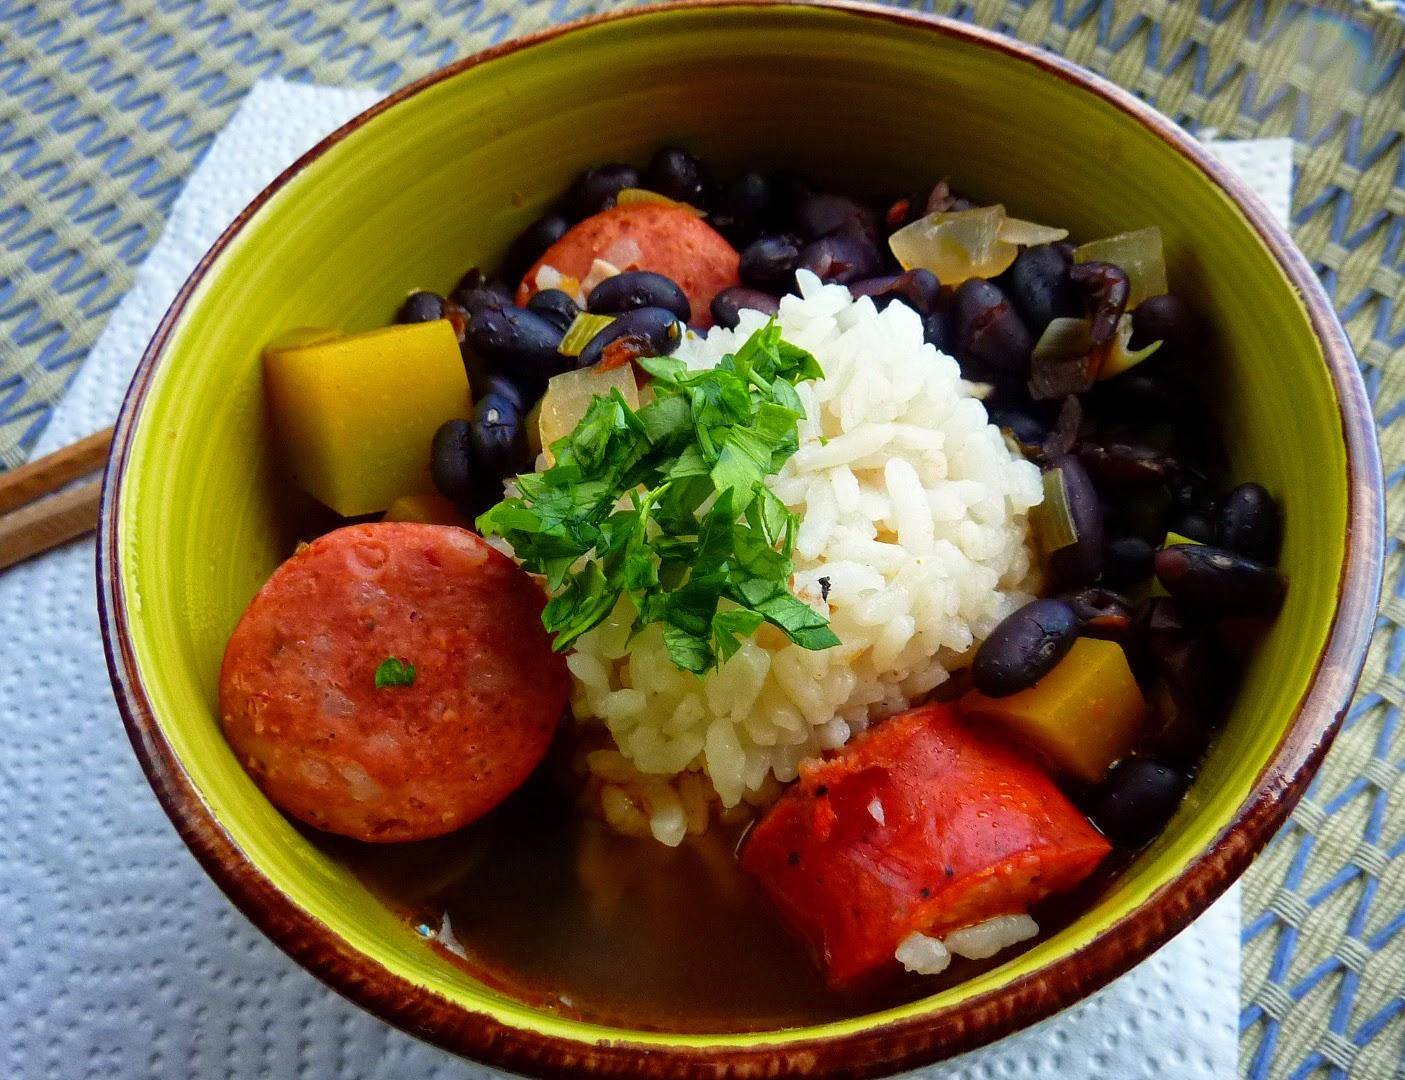 Sopa de Porotos (frijoles, habichuelas) Negros